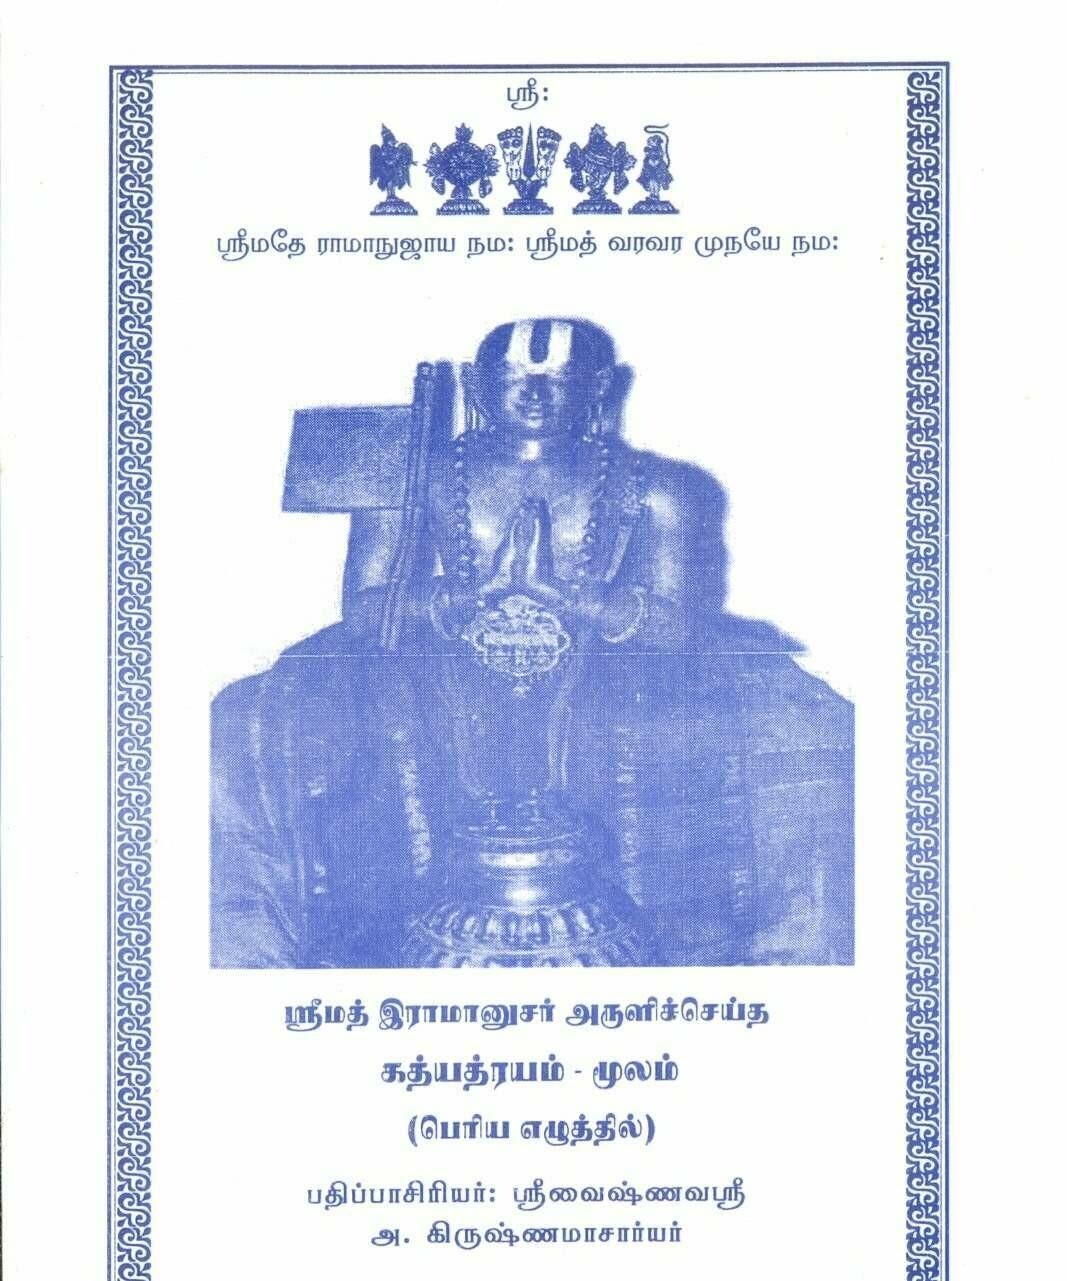 Gadyatrayam moolam big letters, கத்யத்ரயம் மூலம் பெரிய எழுத்தில்